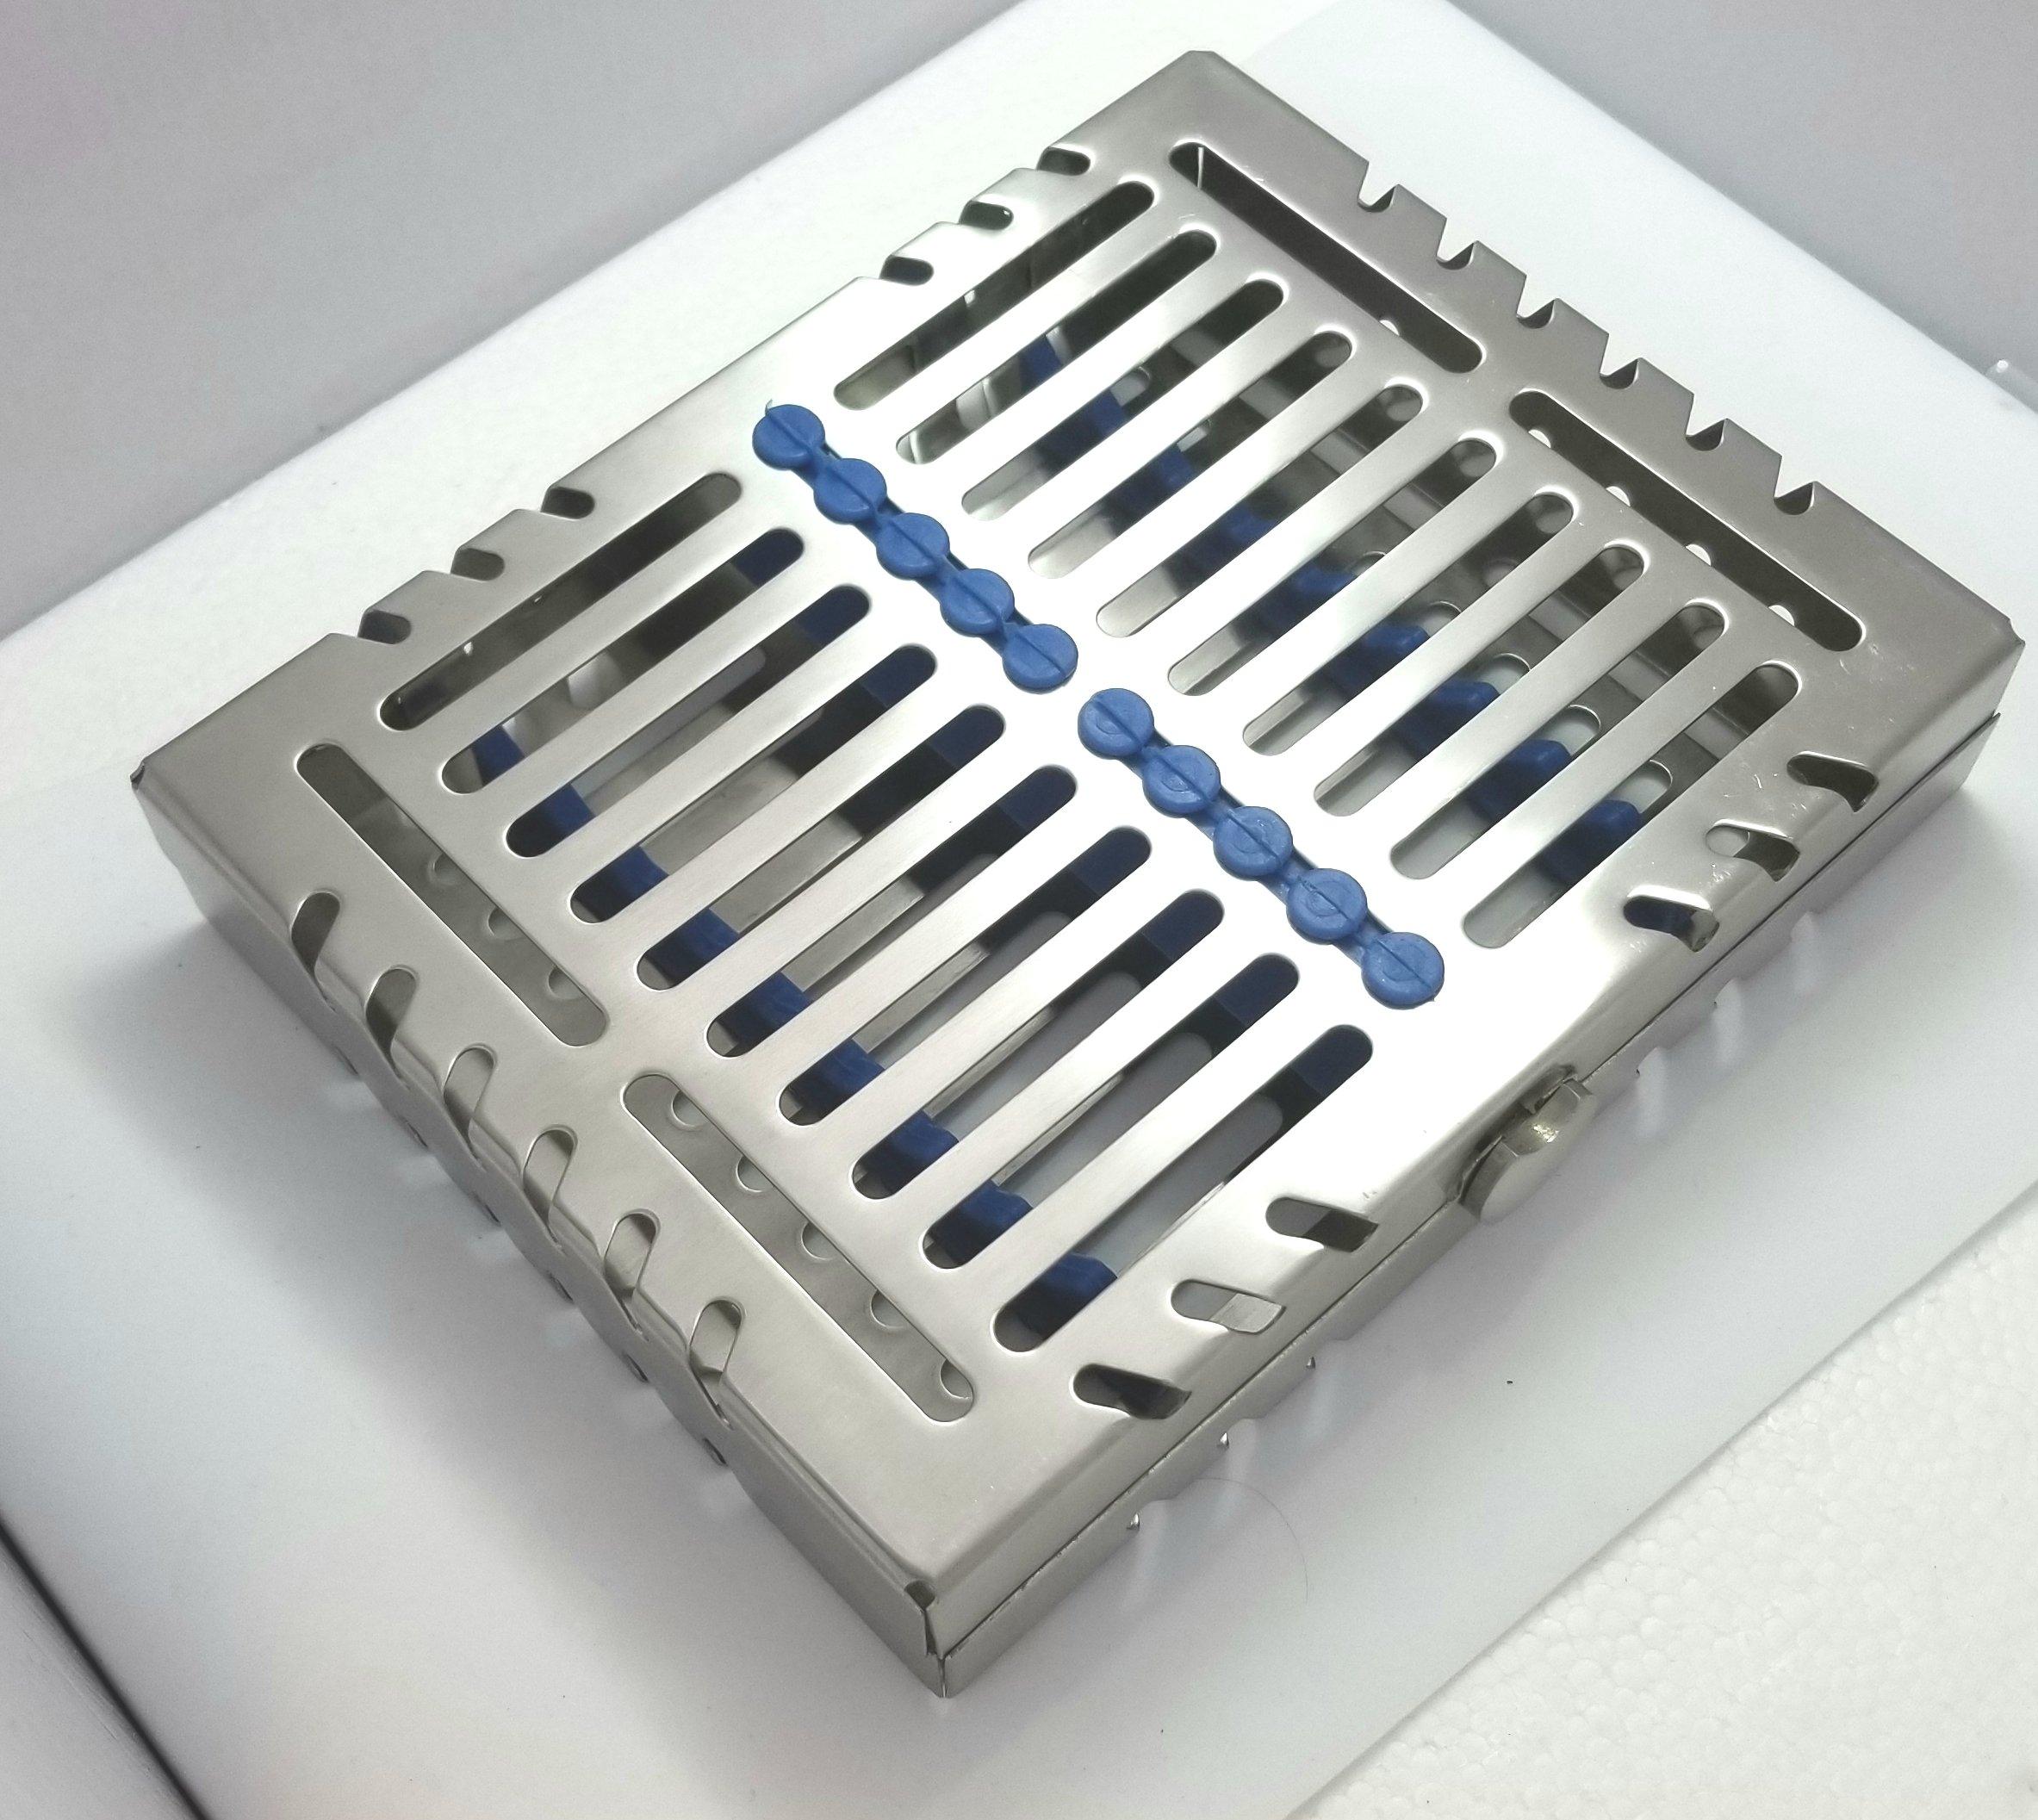 Sterilization cassette tray rack Premium design dental surgical lab 7.25''X5.75''X1.4'' ARTMAN brand by Wise Linkers